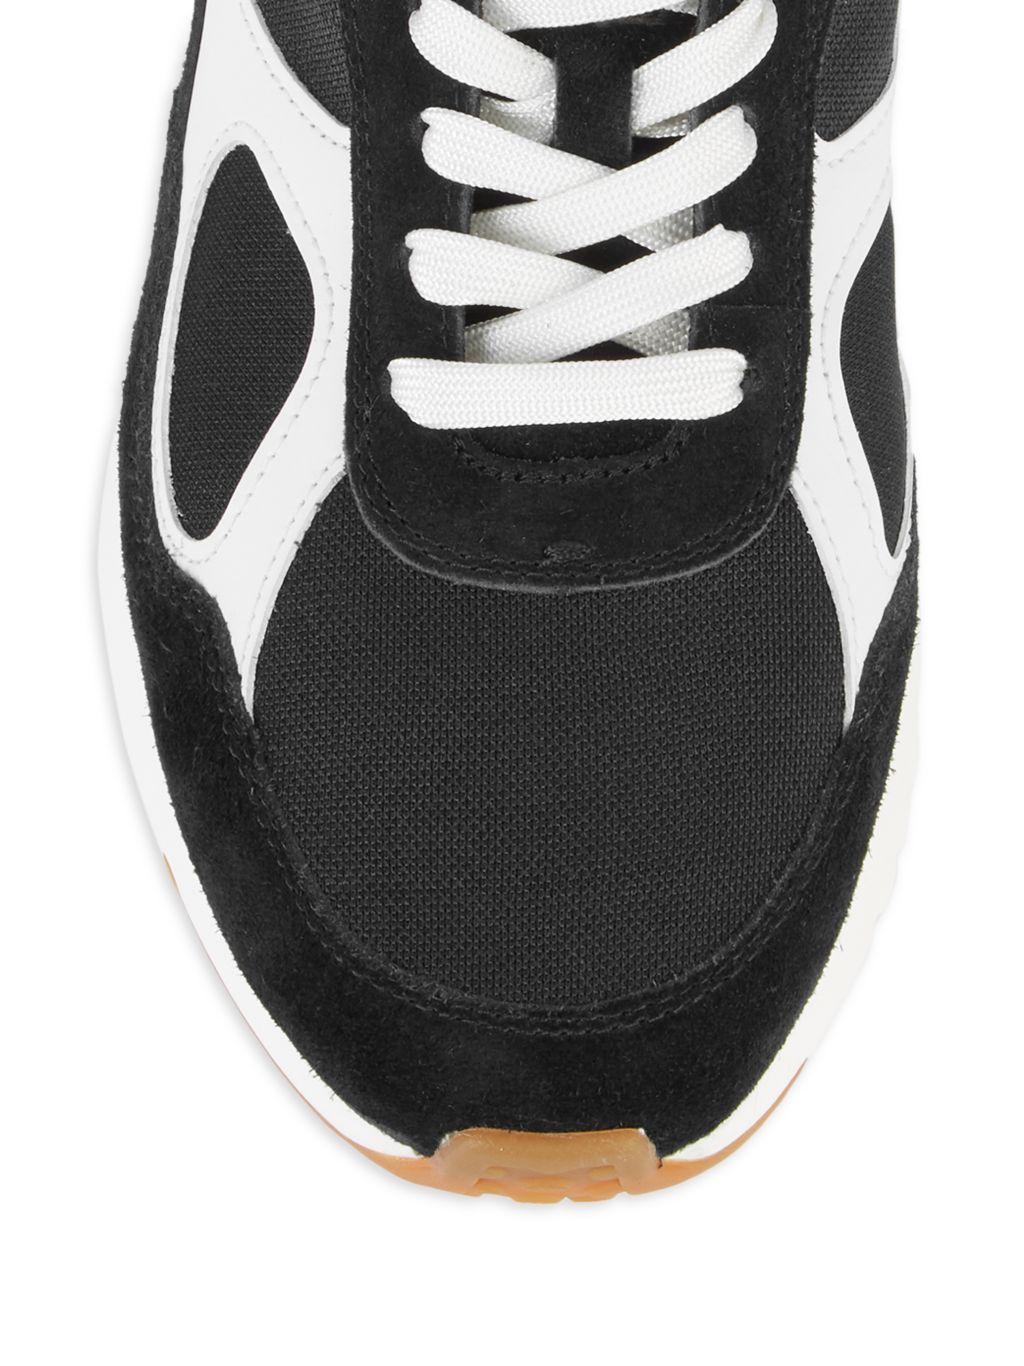 Cole Haan GP CLS Mixed Media Sneakers